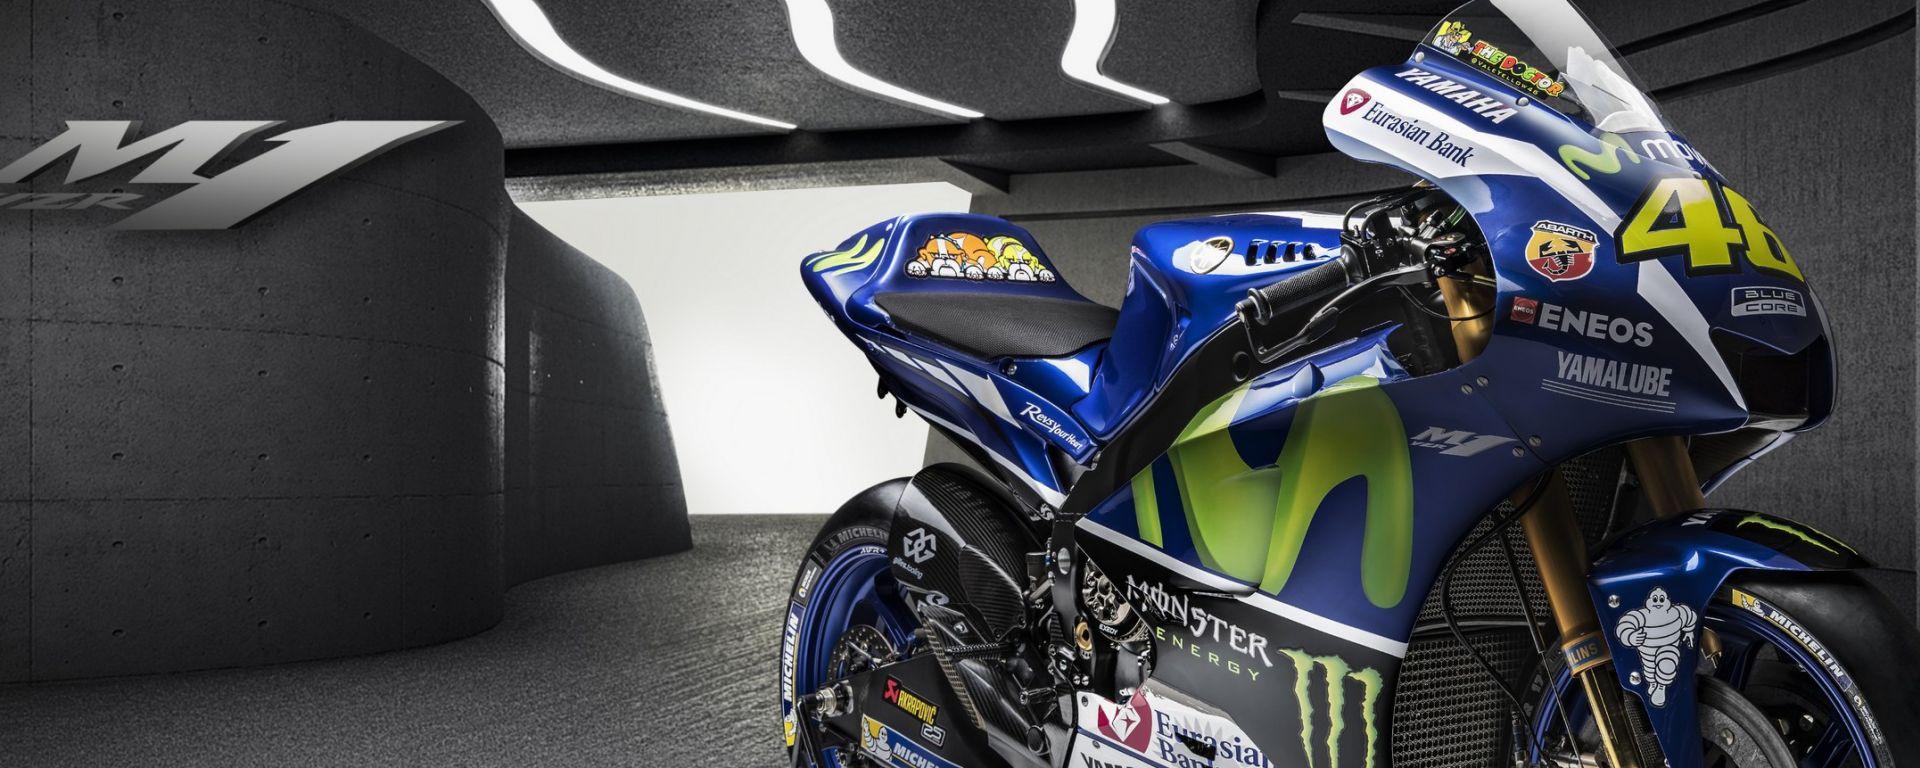 Yamaha YZR-M1 2016, la MotoGP di Rossi e Lorenzo